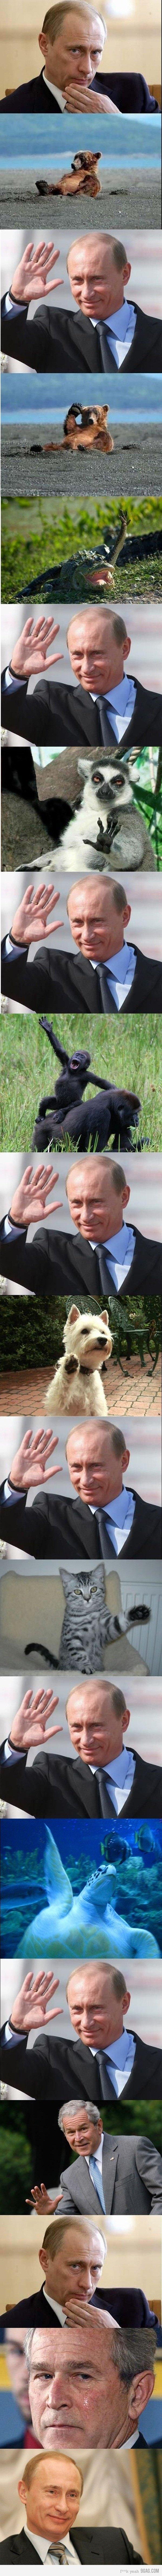 Putinomy. Found on 9gag.. Looks like Bush was... Putinomy Found on 9gag Looks like Bush was